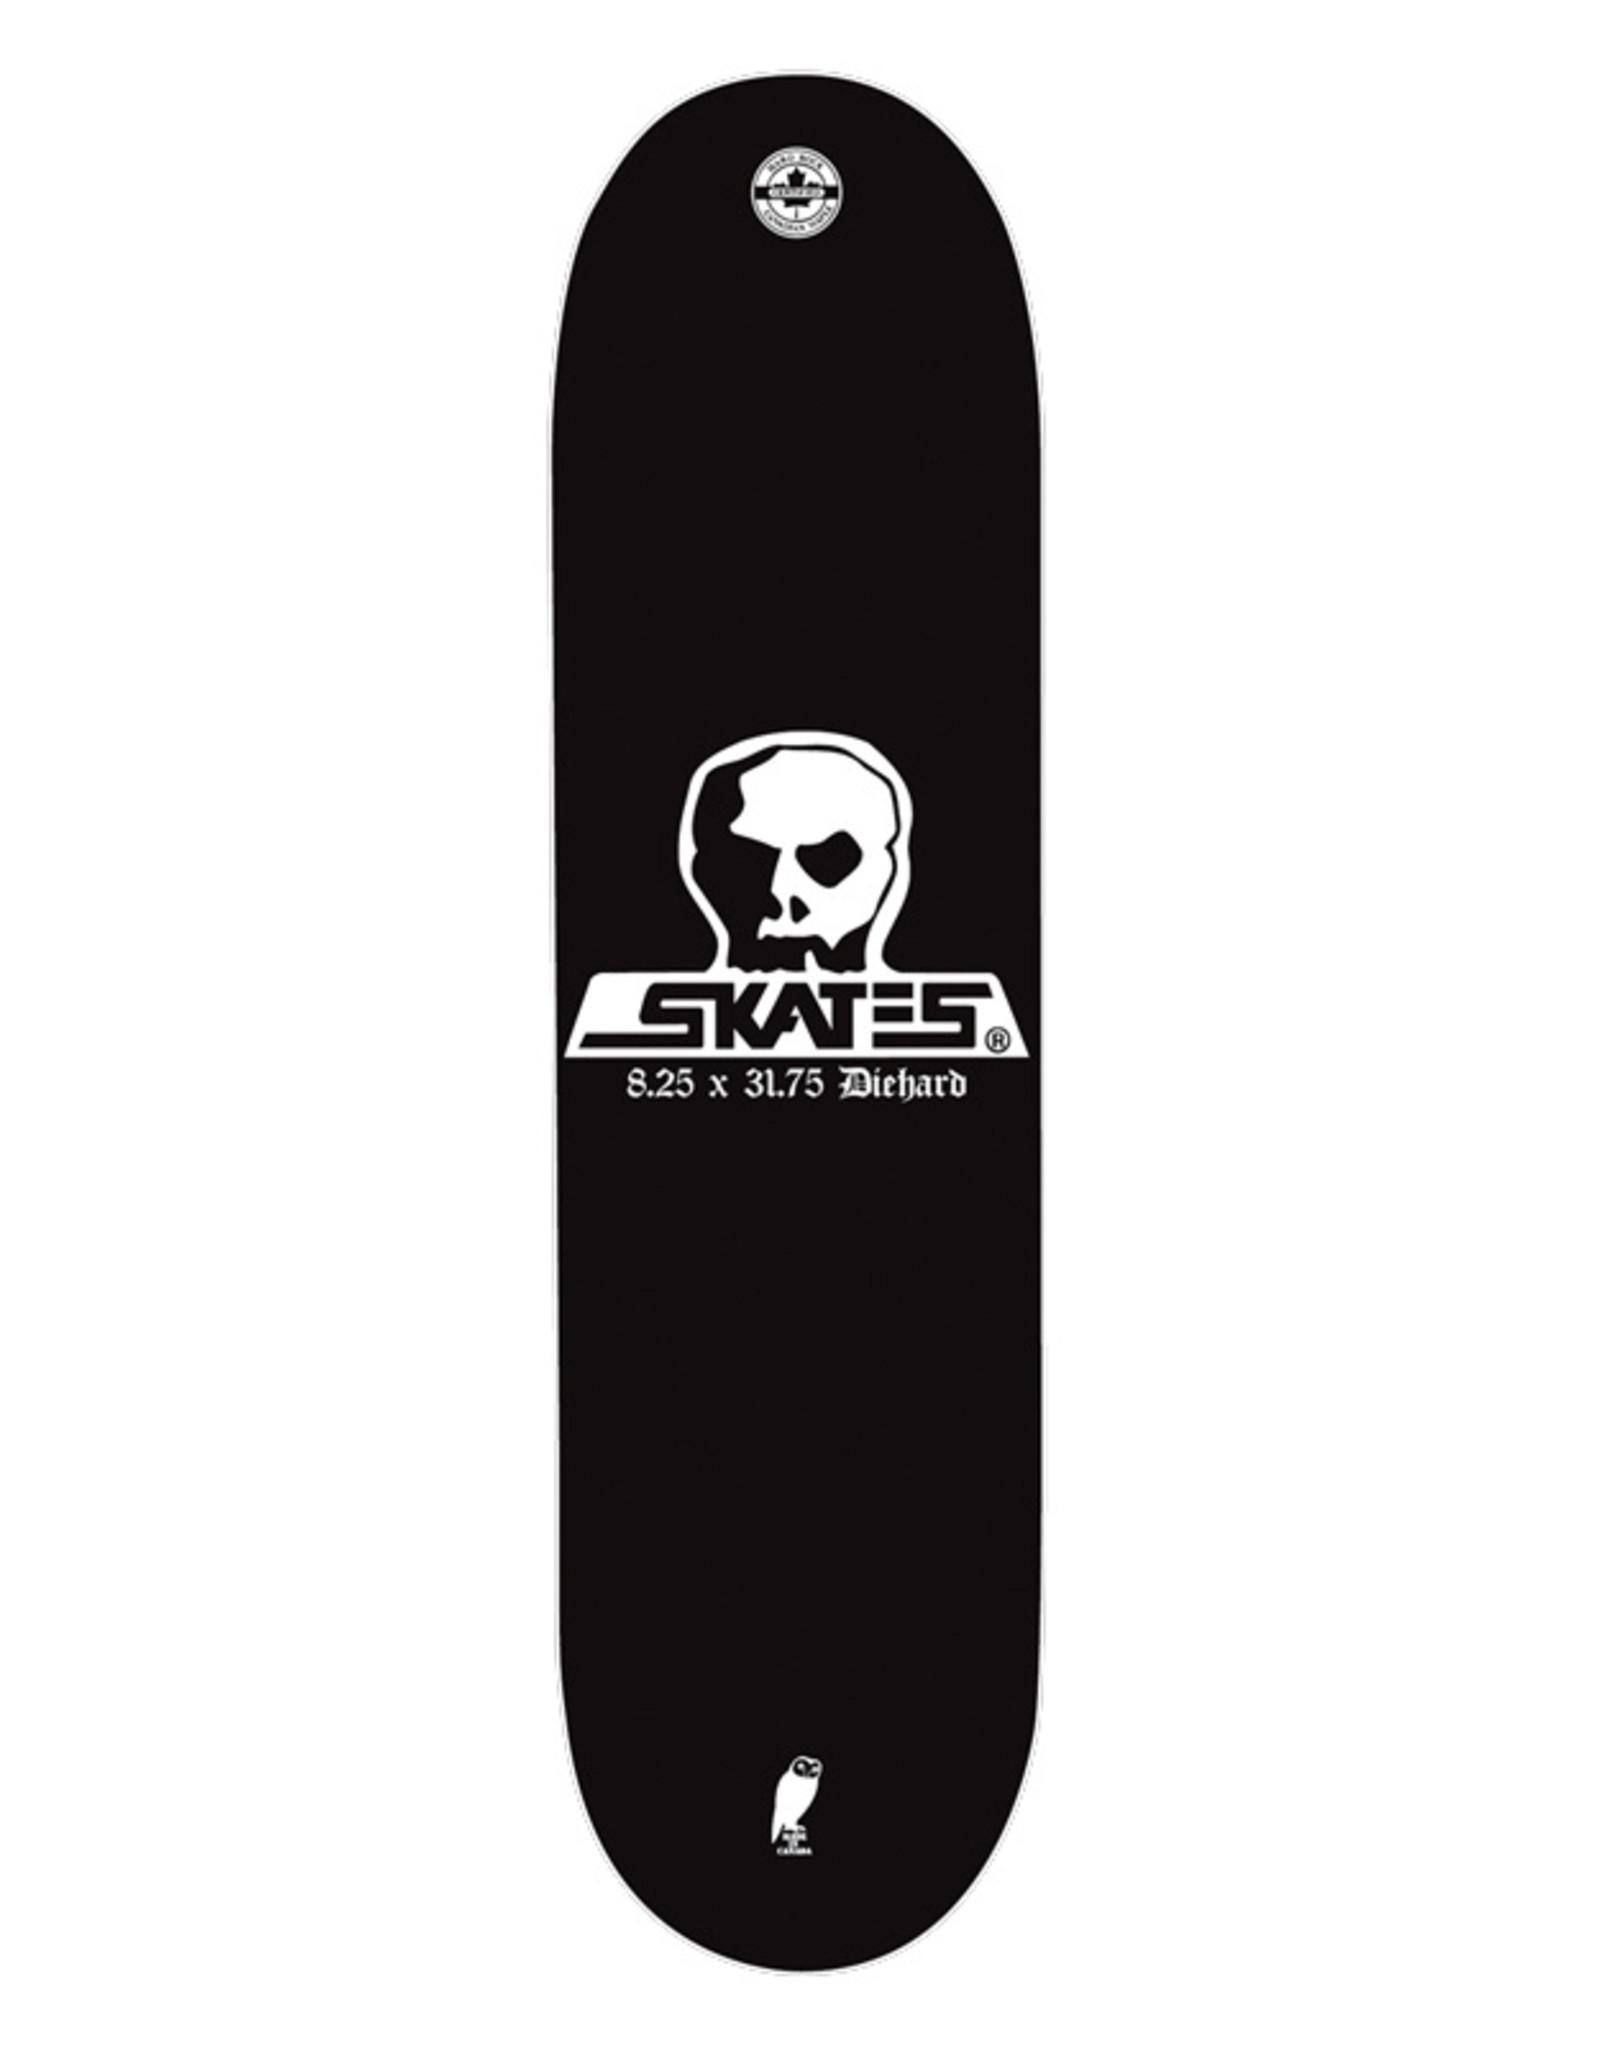 Skull Skates SKULL DECK DIEHARD 8.25x31.75